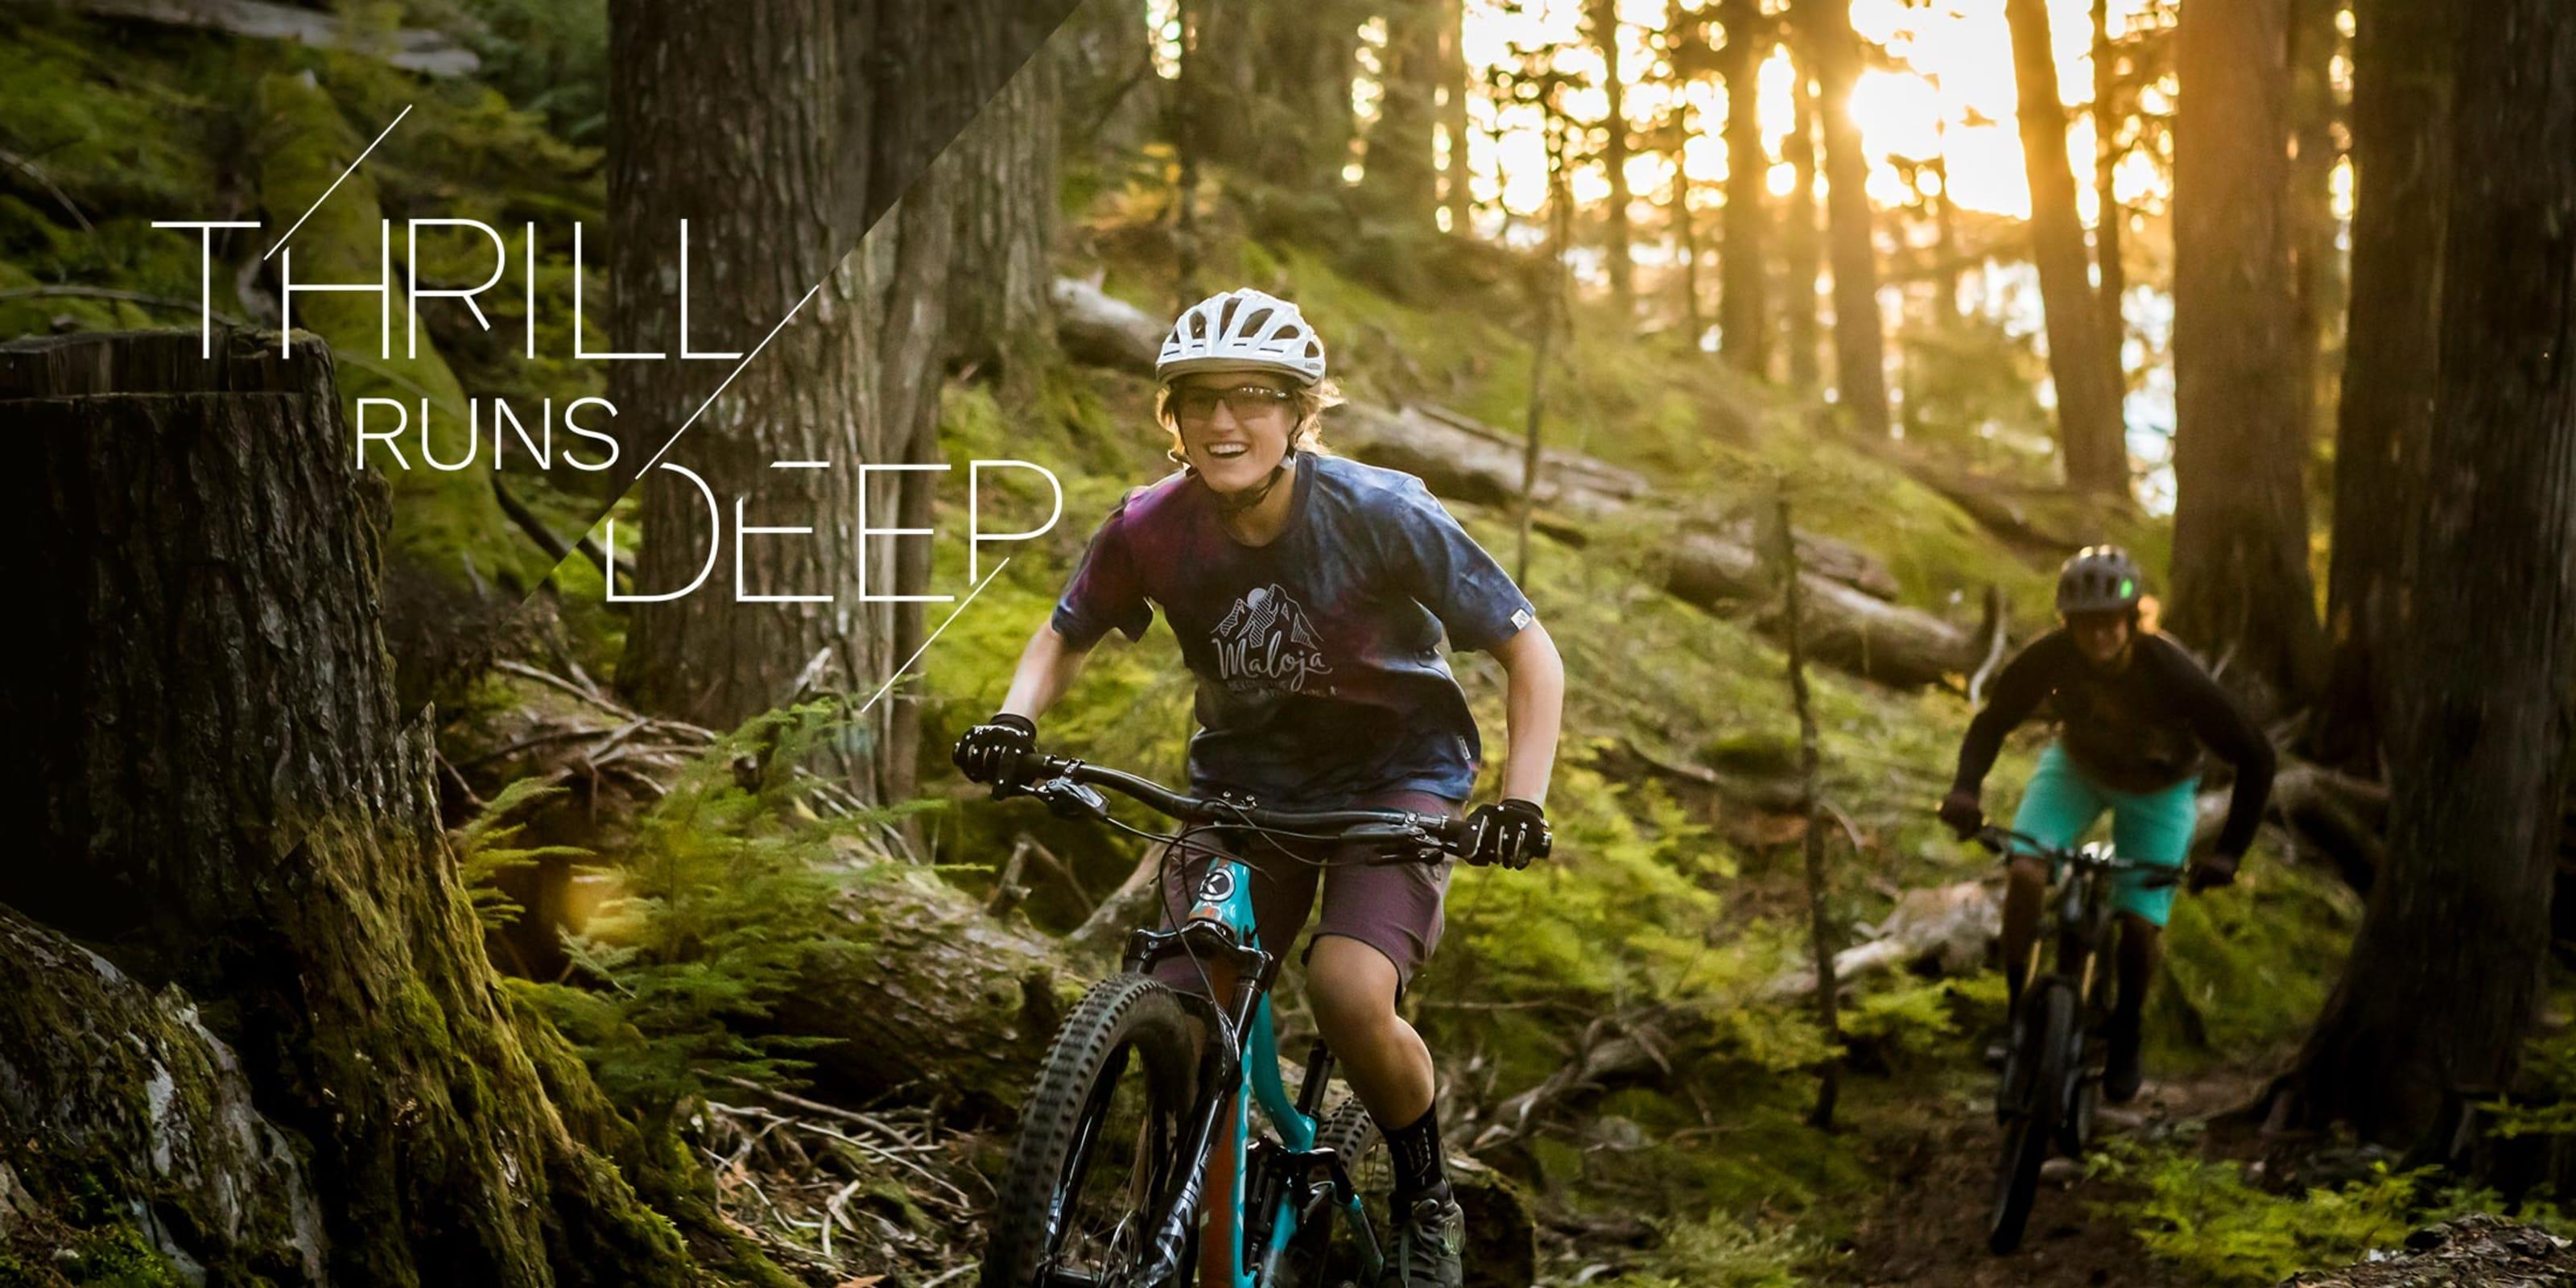 Thrill runs deep when riding in Whistler BC Canada